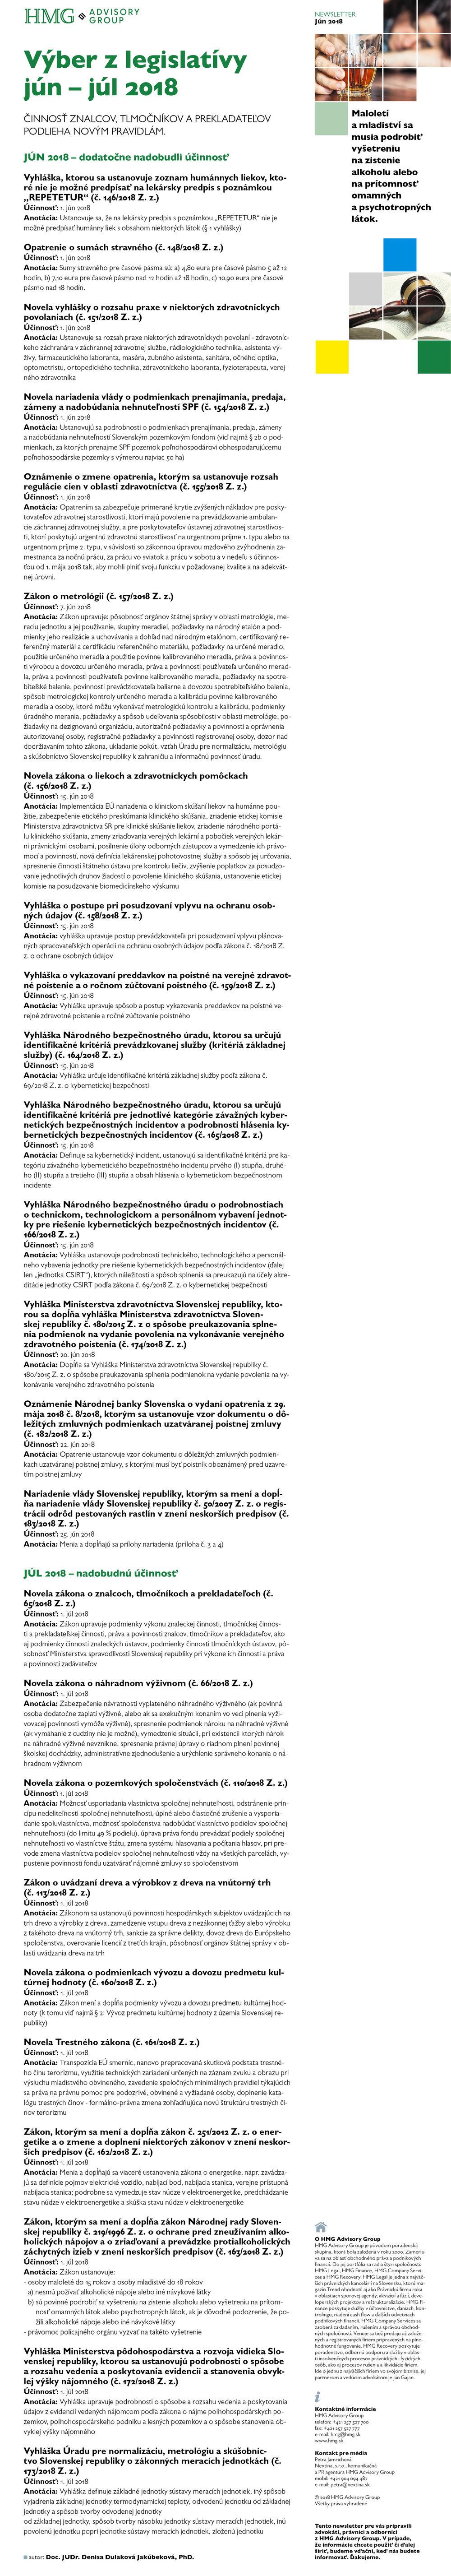 HMG_newsletter_legislatva_jun.jpg